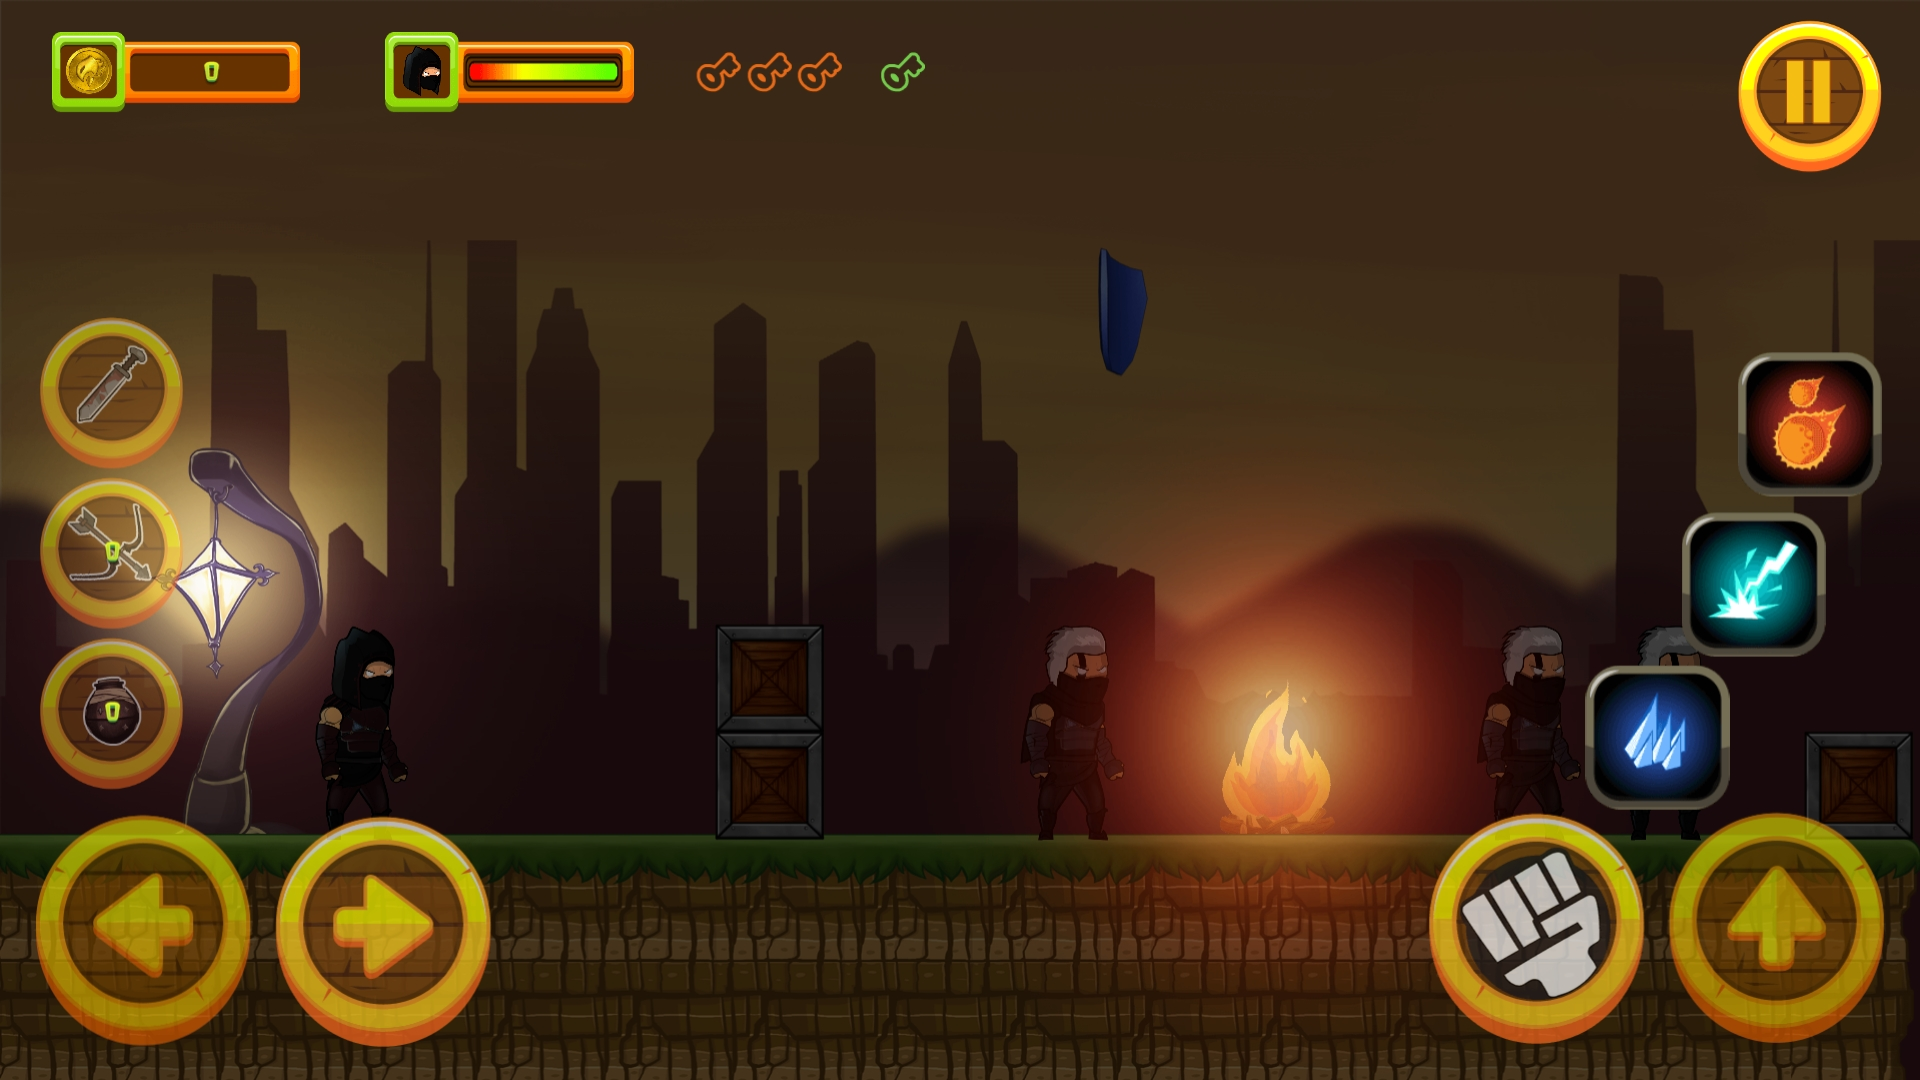 Black Assassin - HTML5 Game + Mobile Version (Construct 3 / C3P) - 11